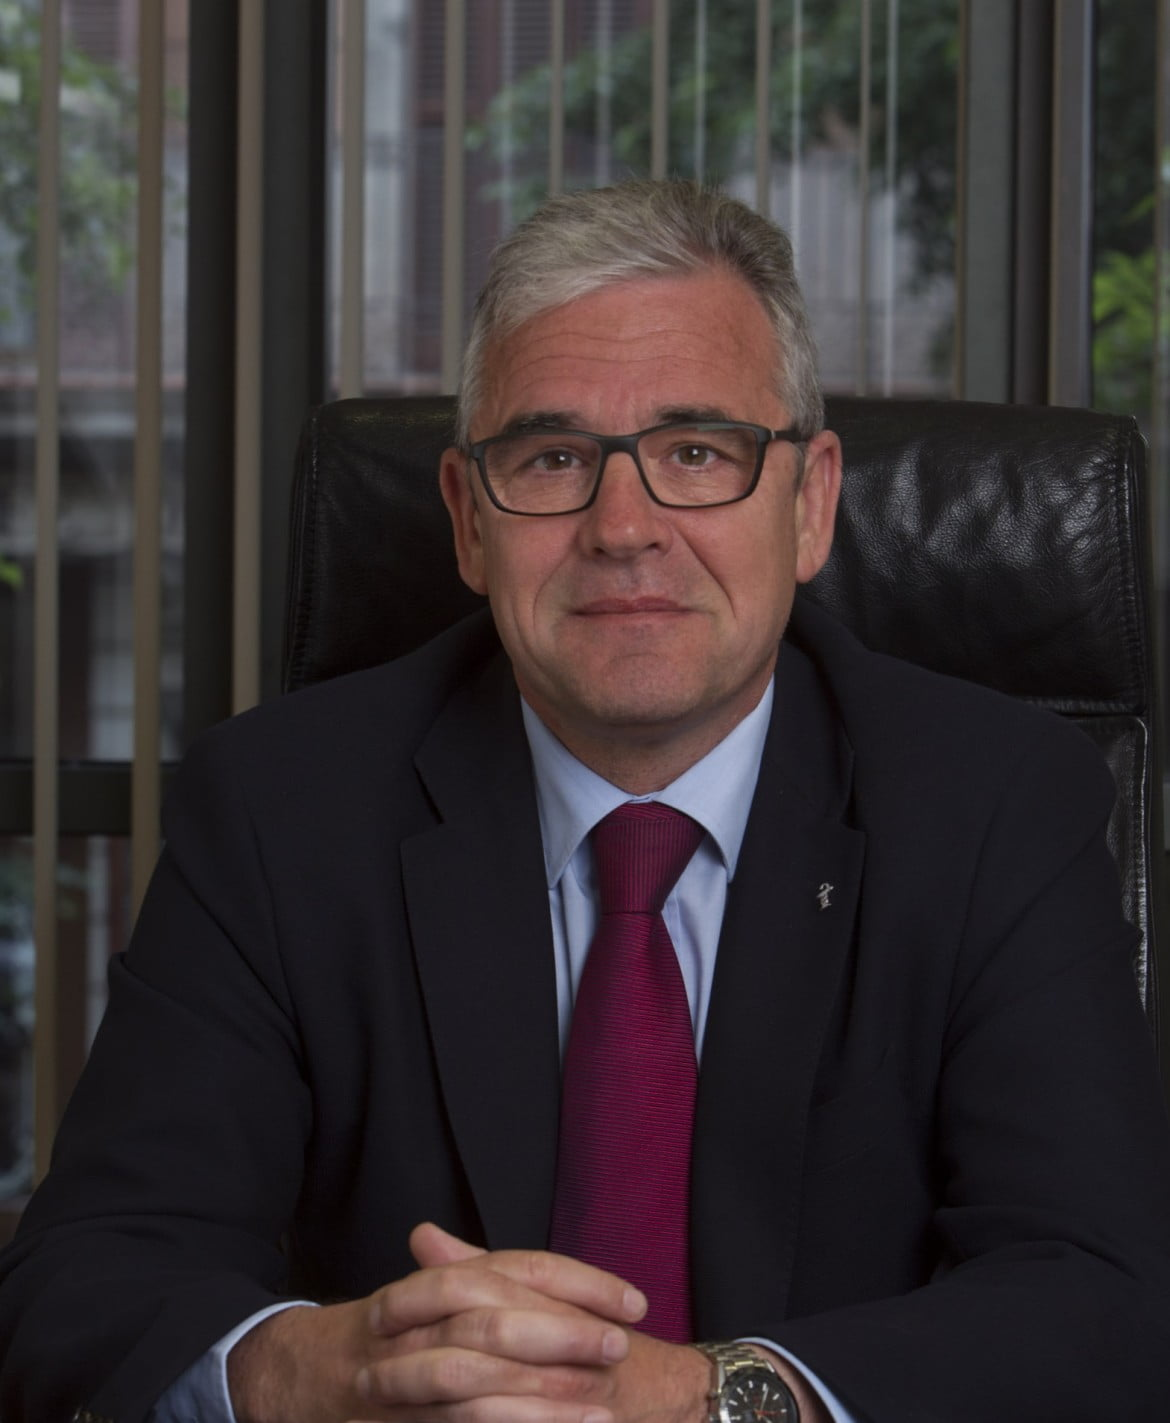 Jordi de Dalmases, reelegido como presidente del Col·legi de Farmacèutics de Barcelona